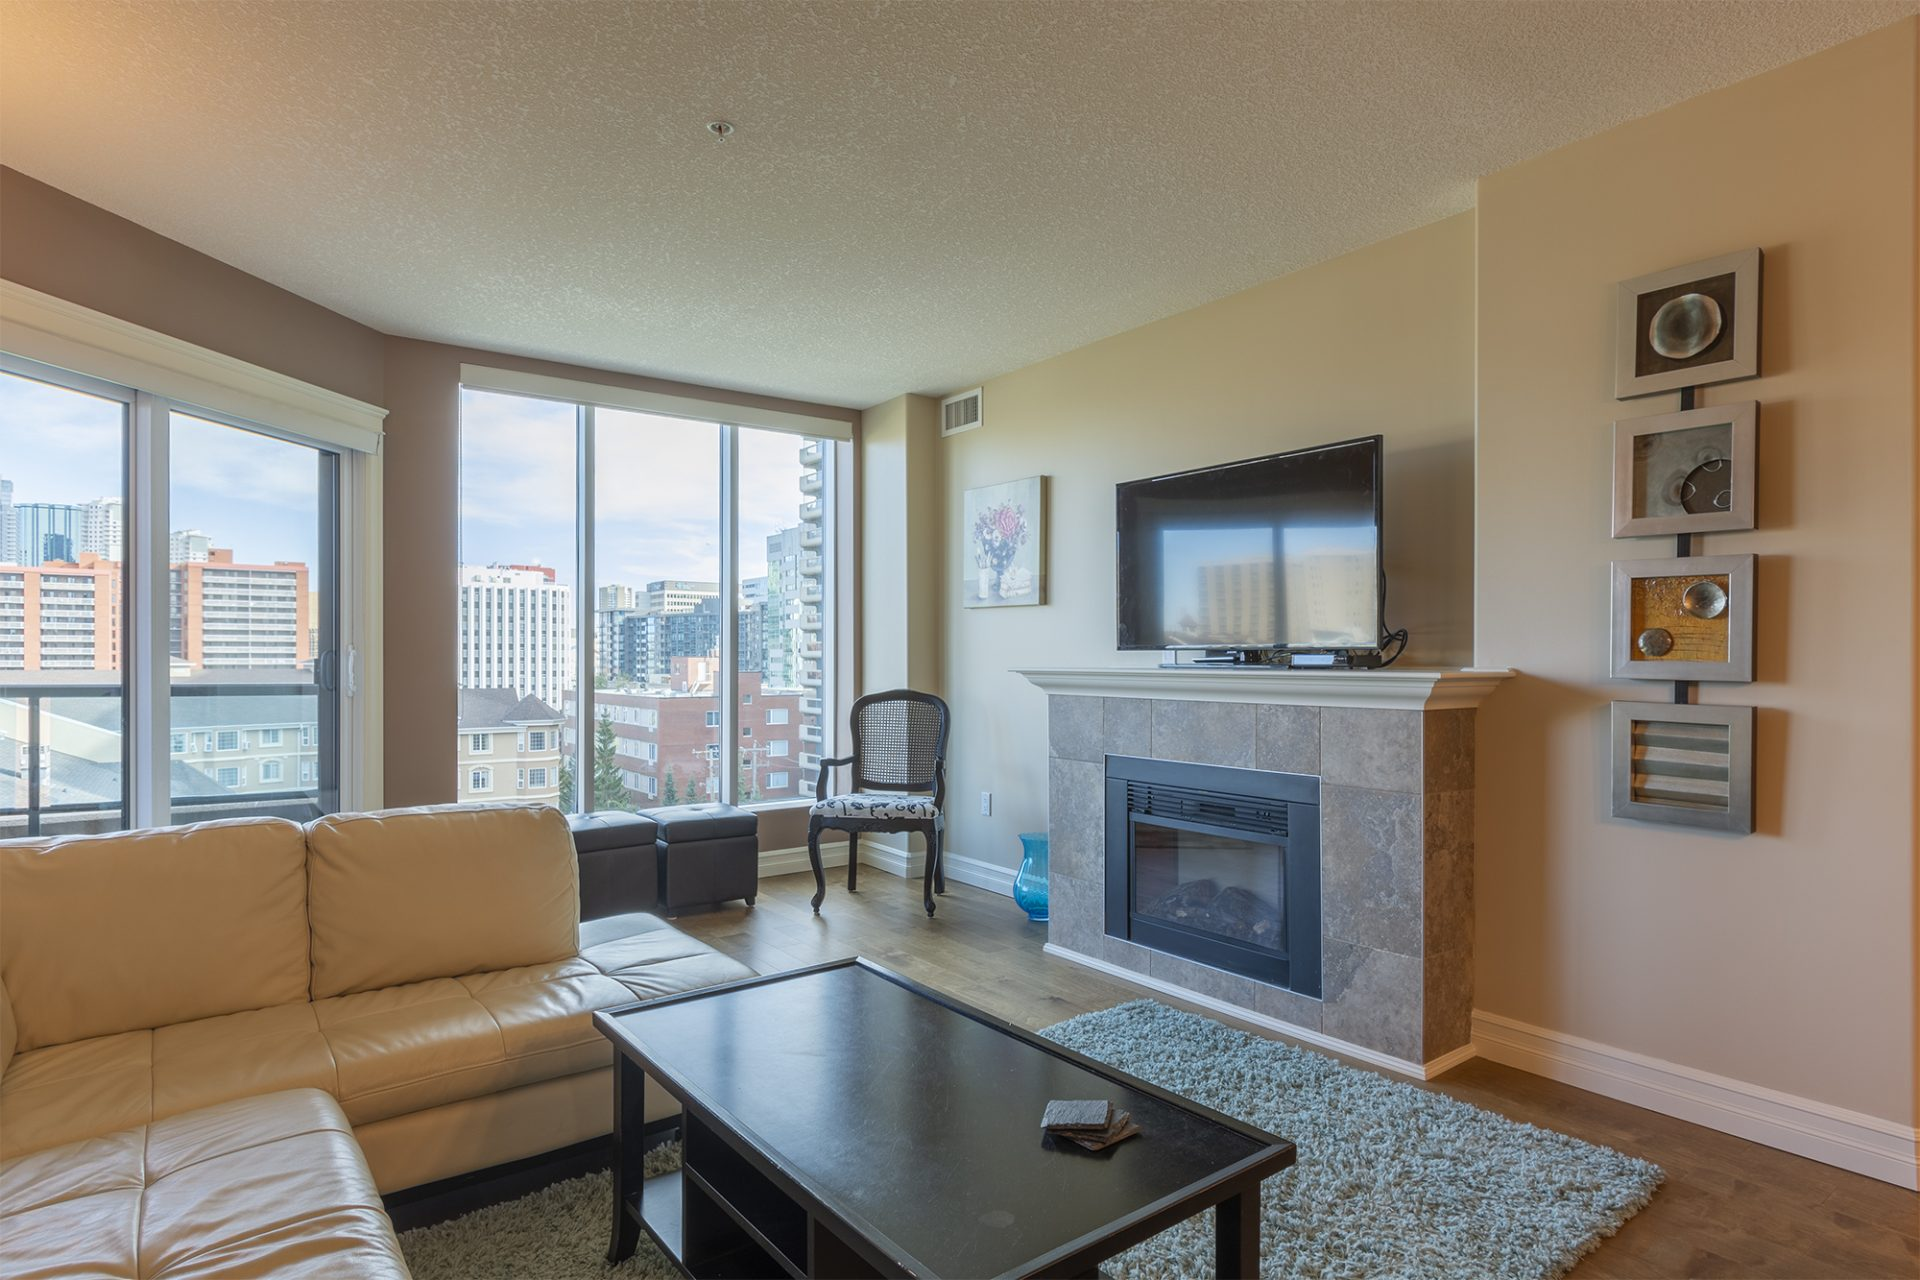 MHA_Meridian_2020_Living Room_1